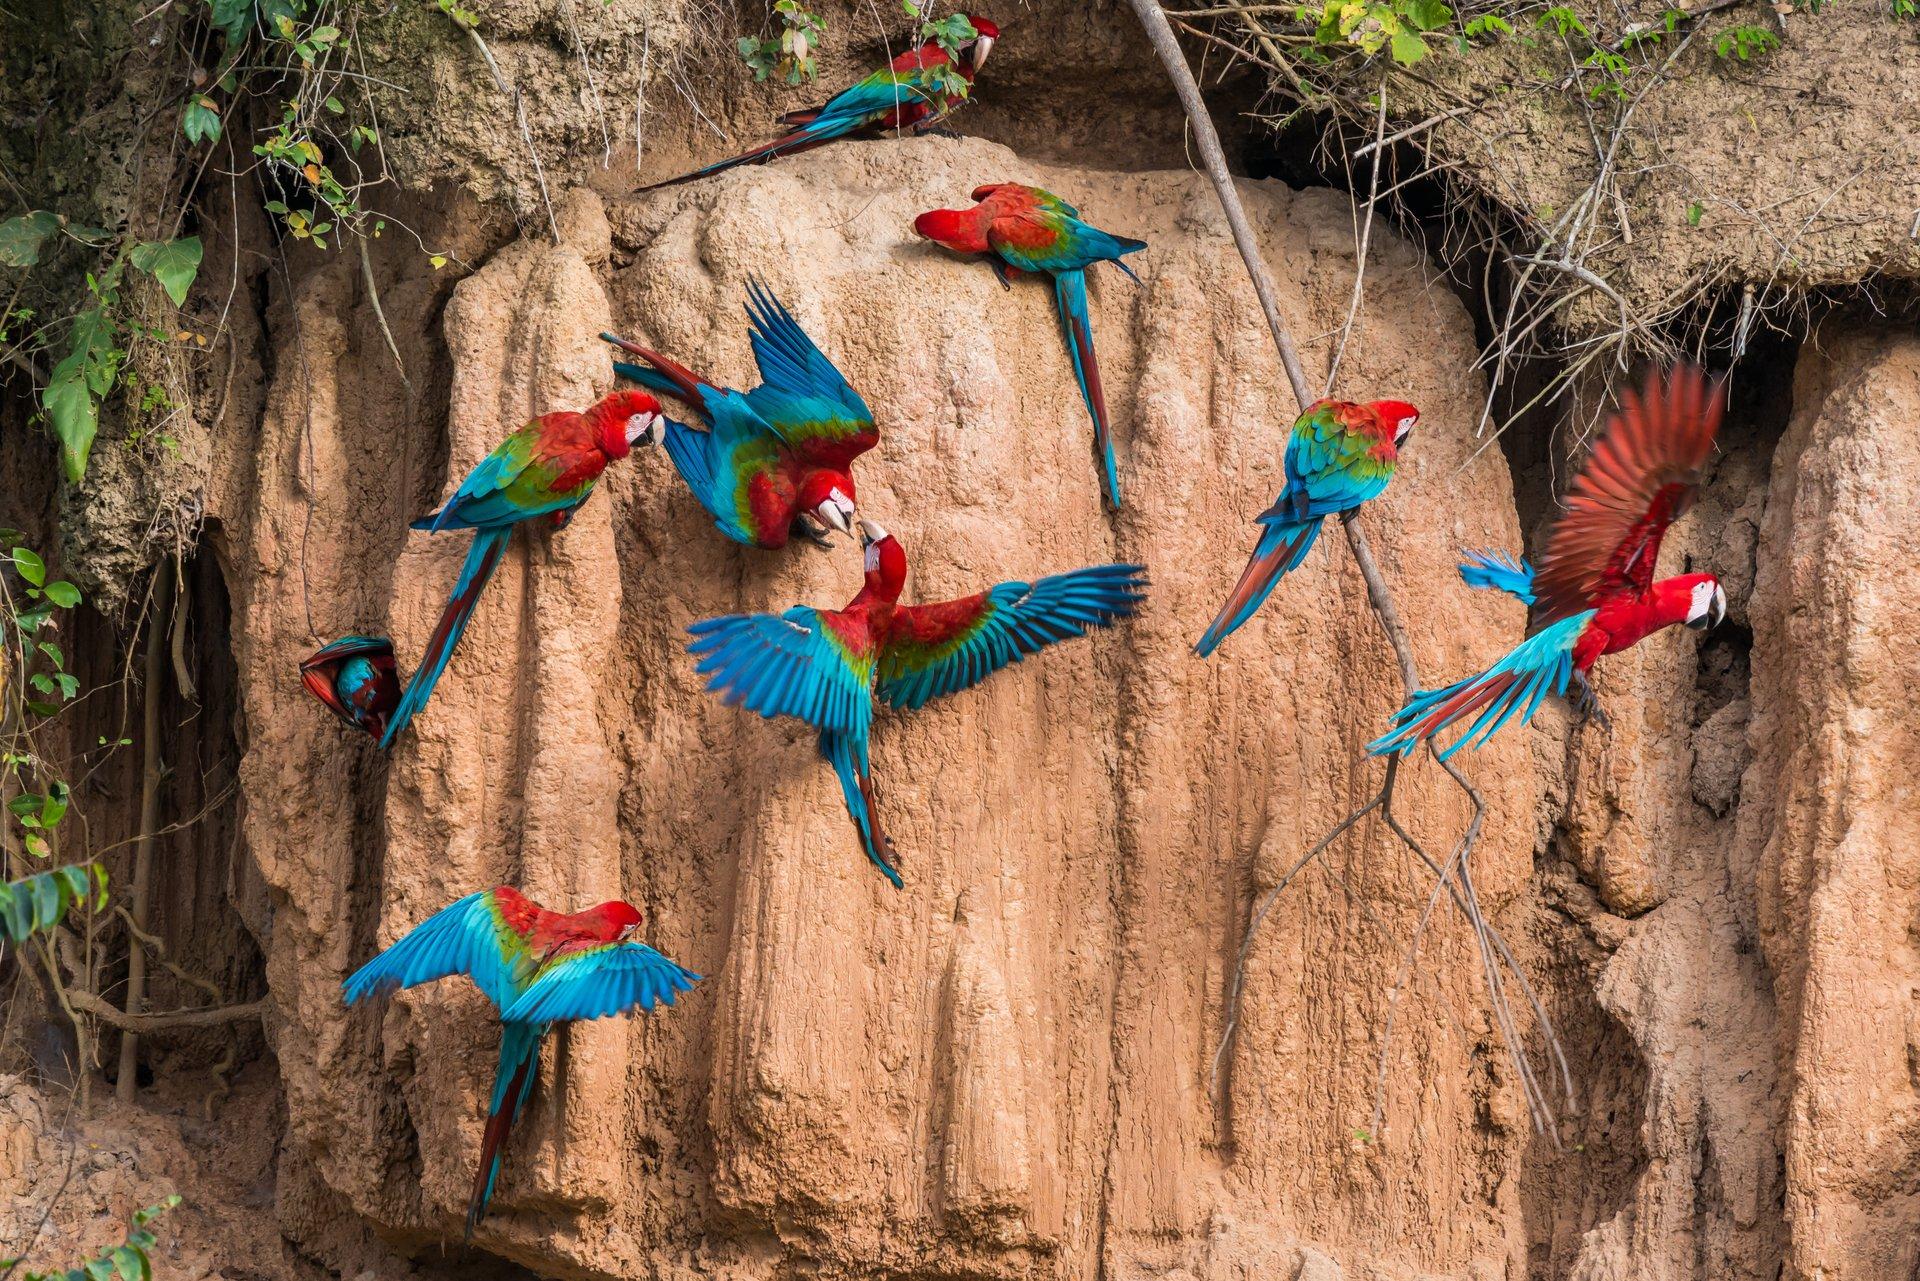 Macaw Clay Lick in Machu Picchu and Cusco 2019 - Best Time